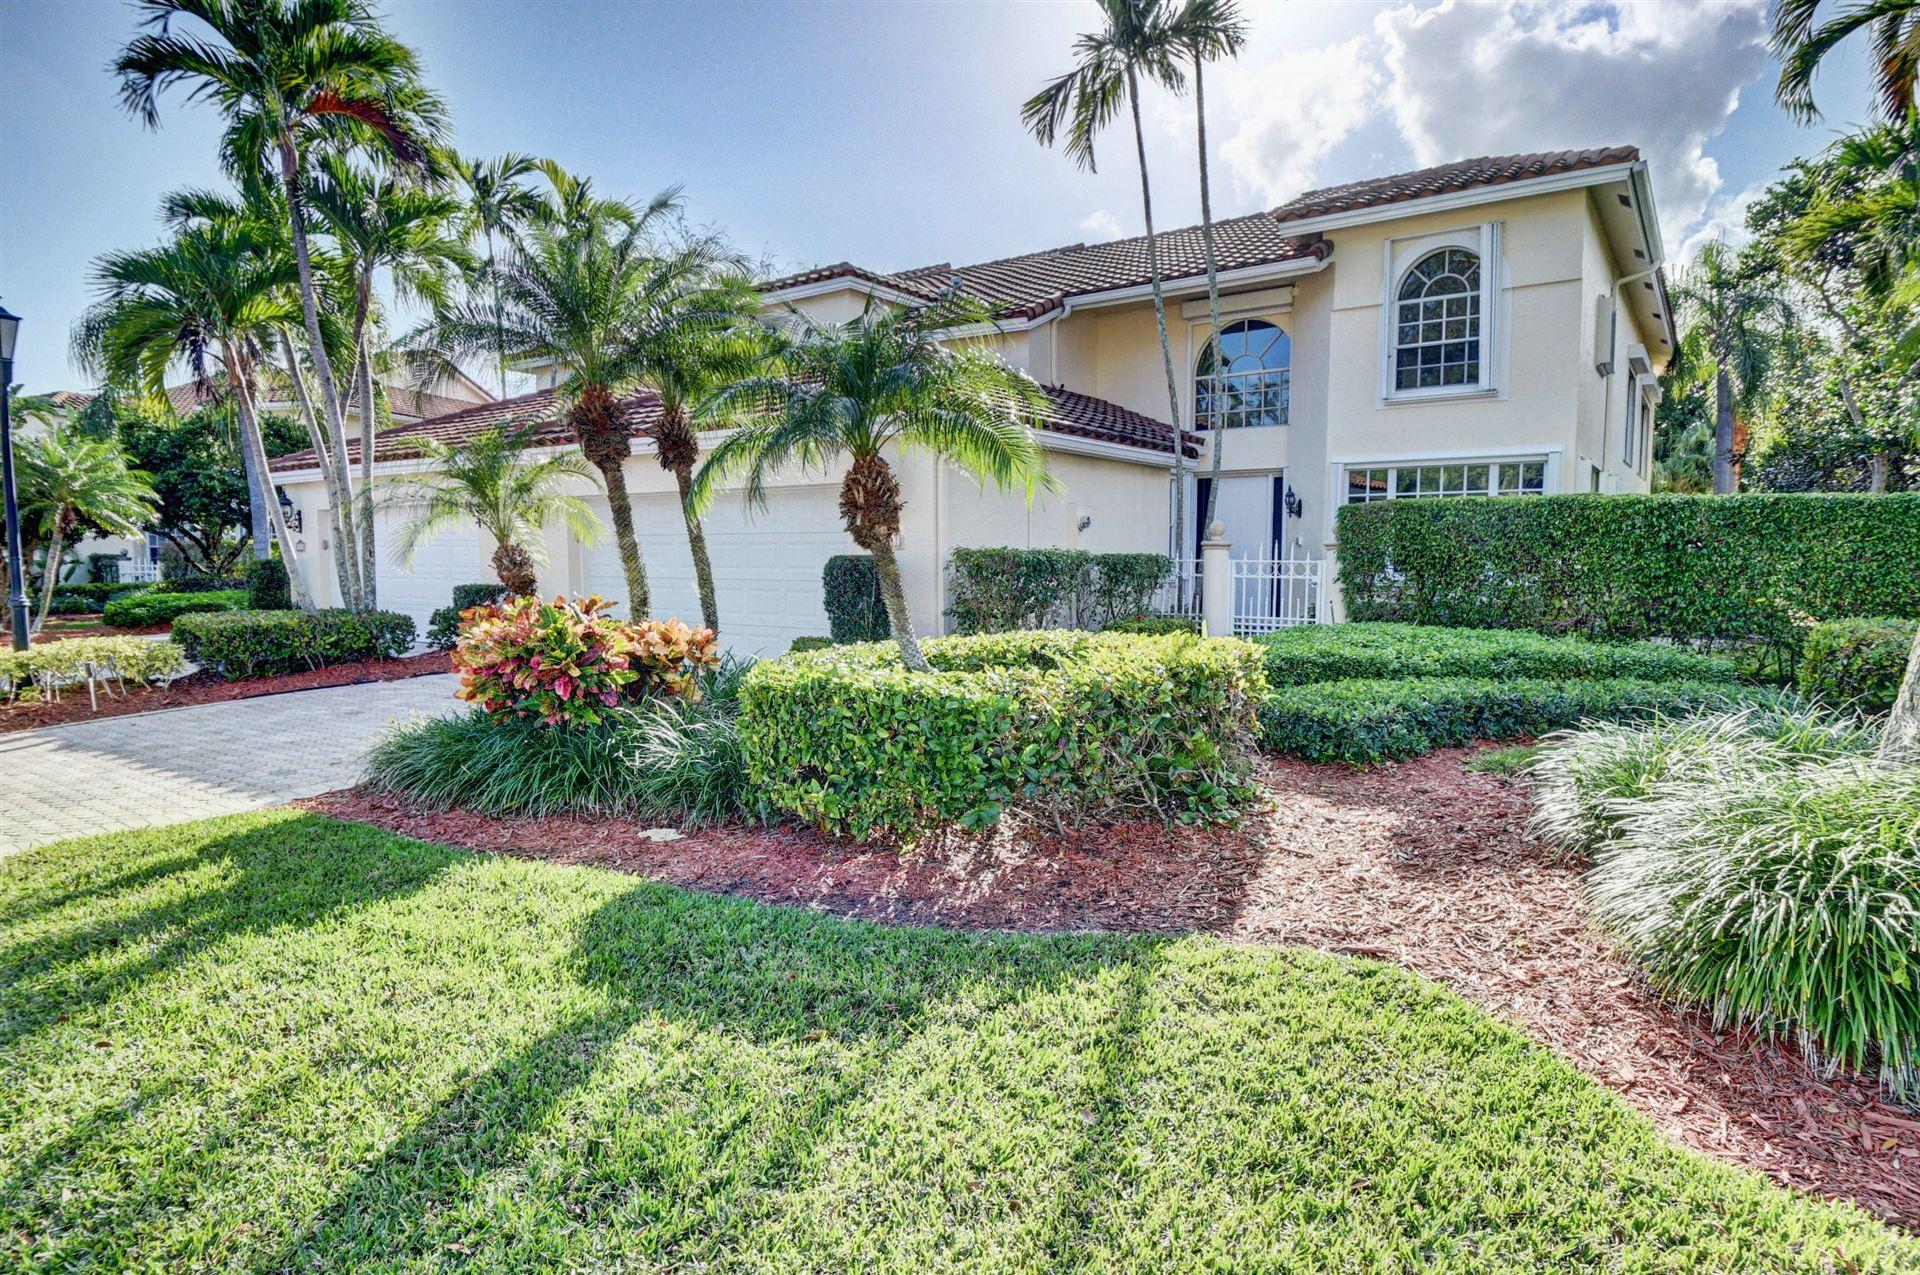 5821 NW 24th Terrace, Boca Raton, FL 33496 - #: RX-10601375